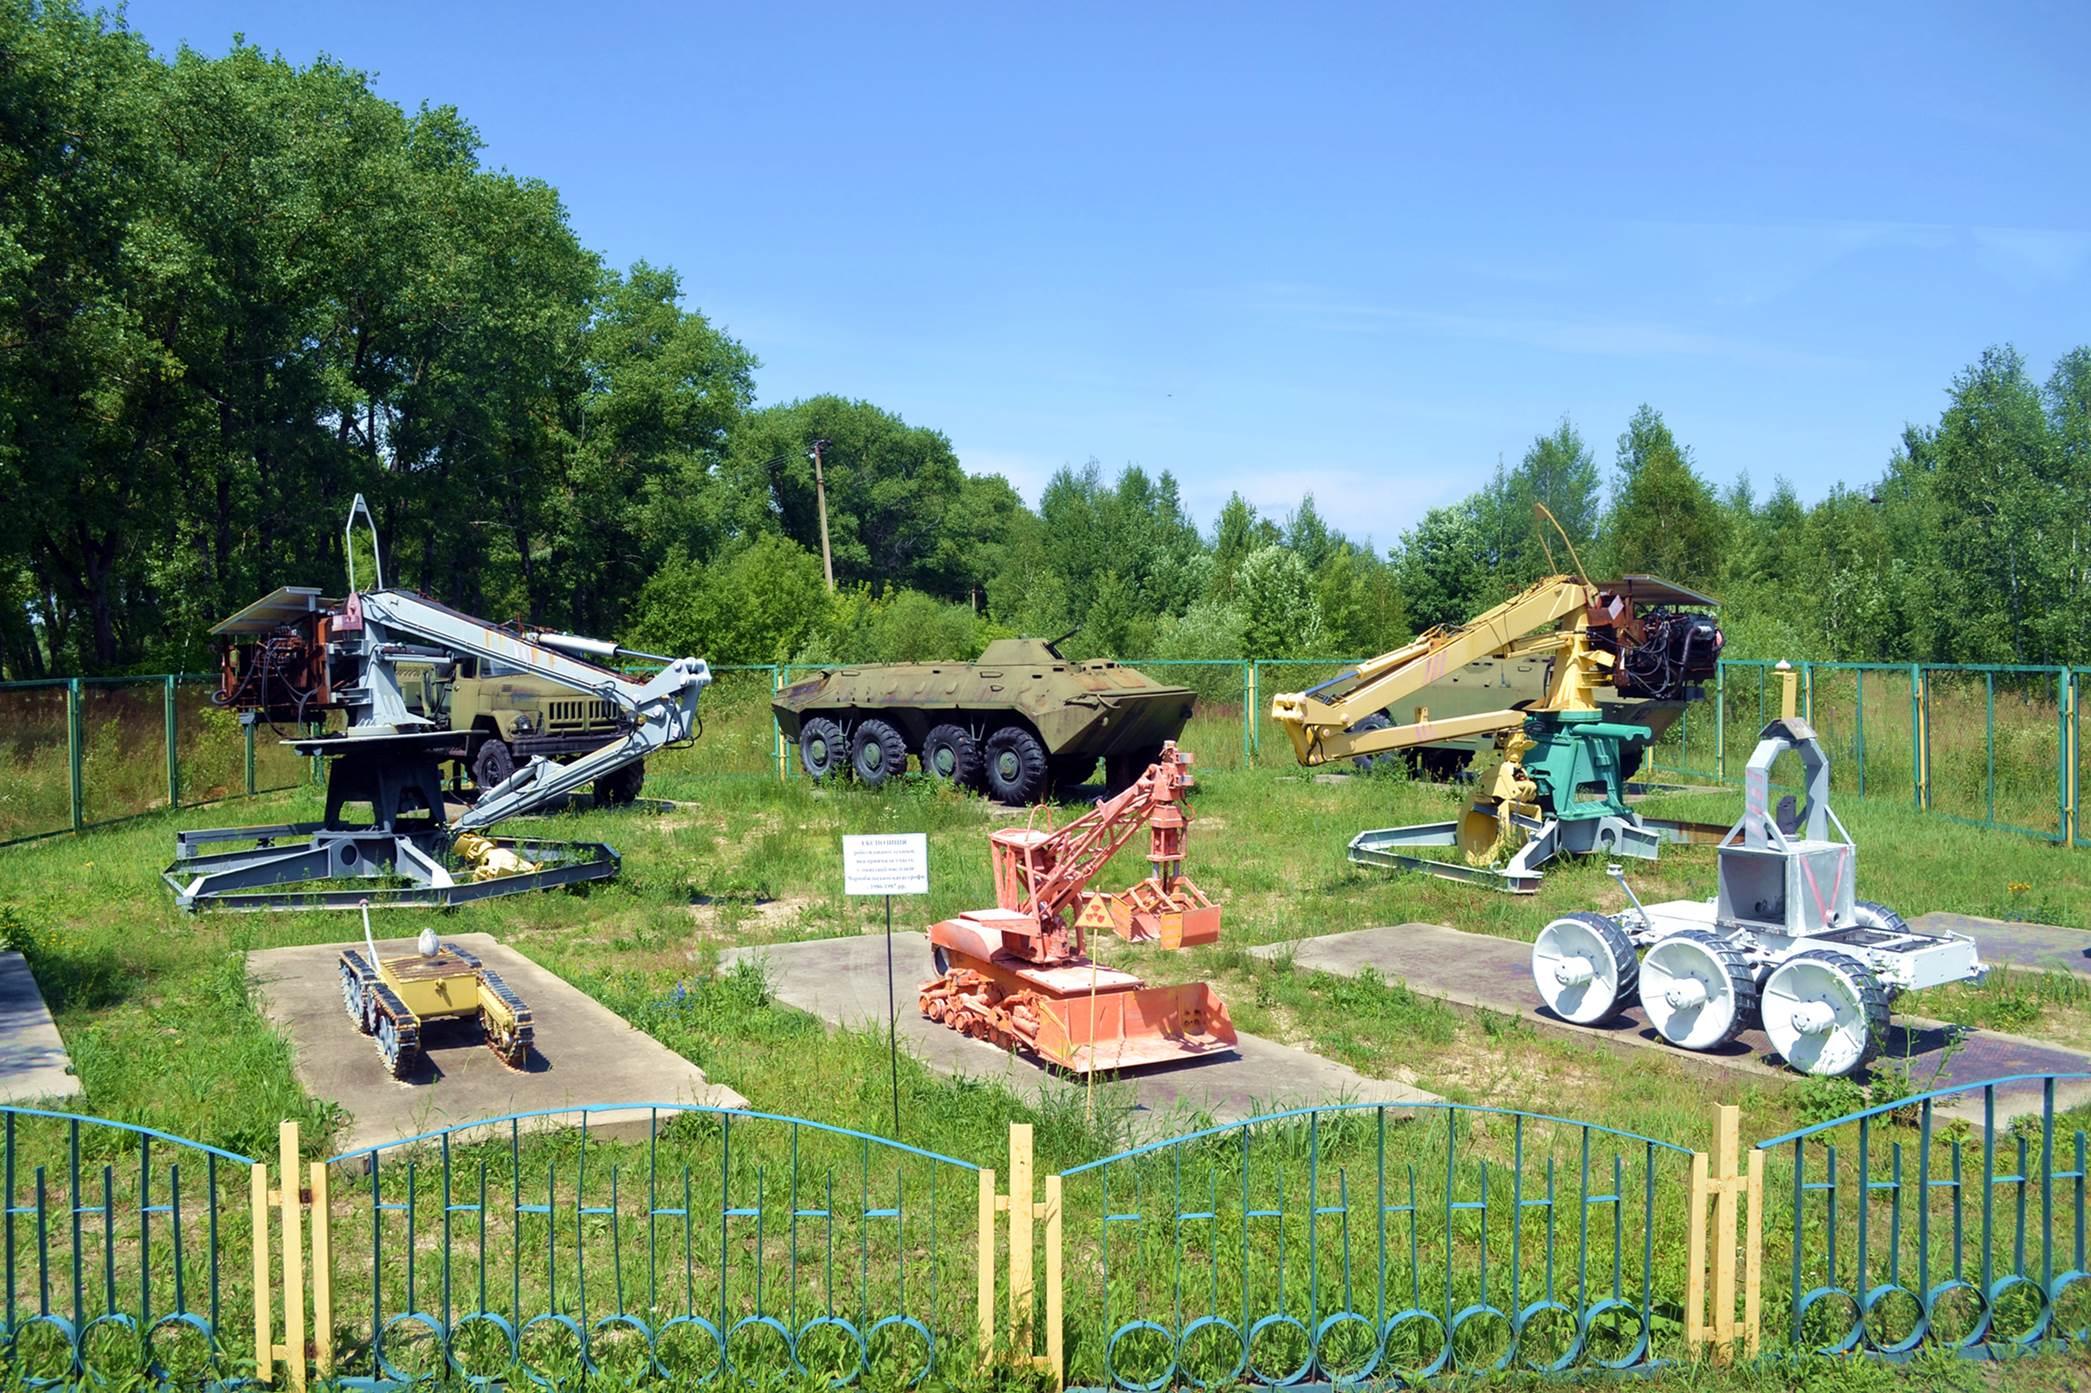 chernobyl_ucrania_maquinas